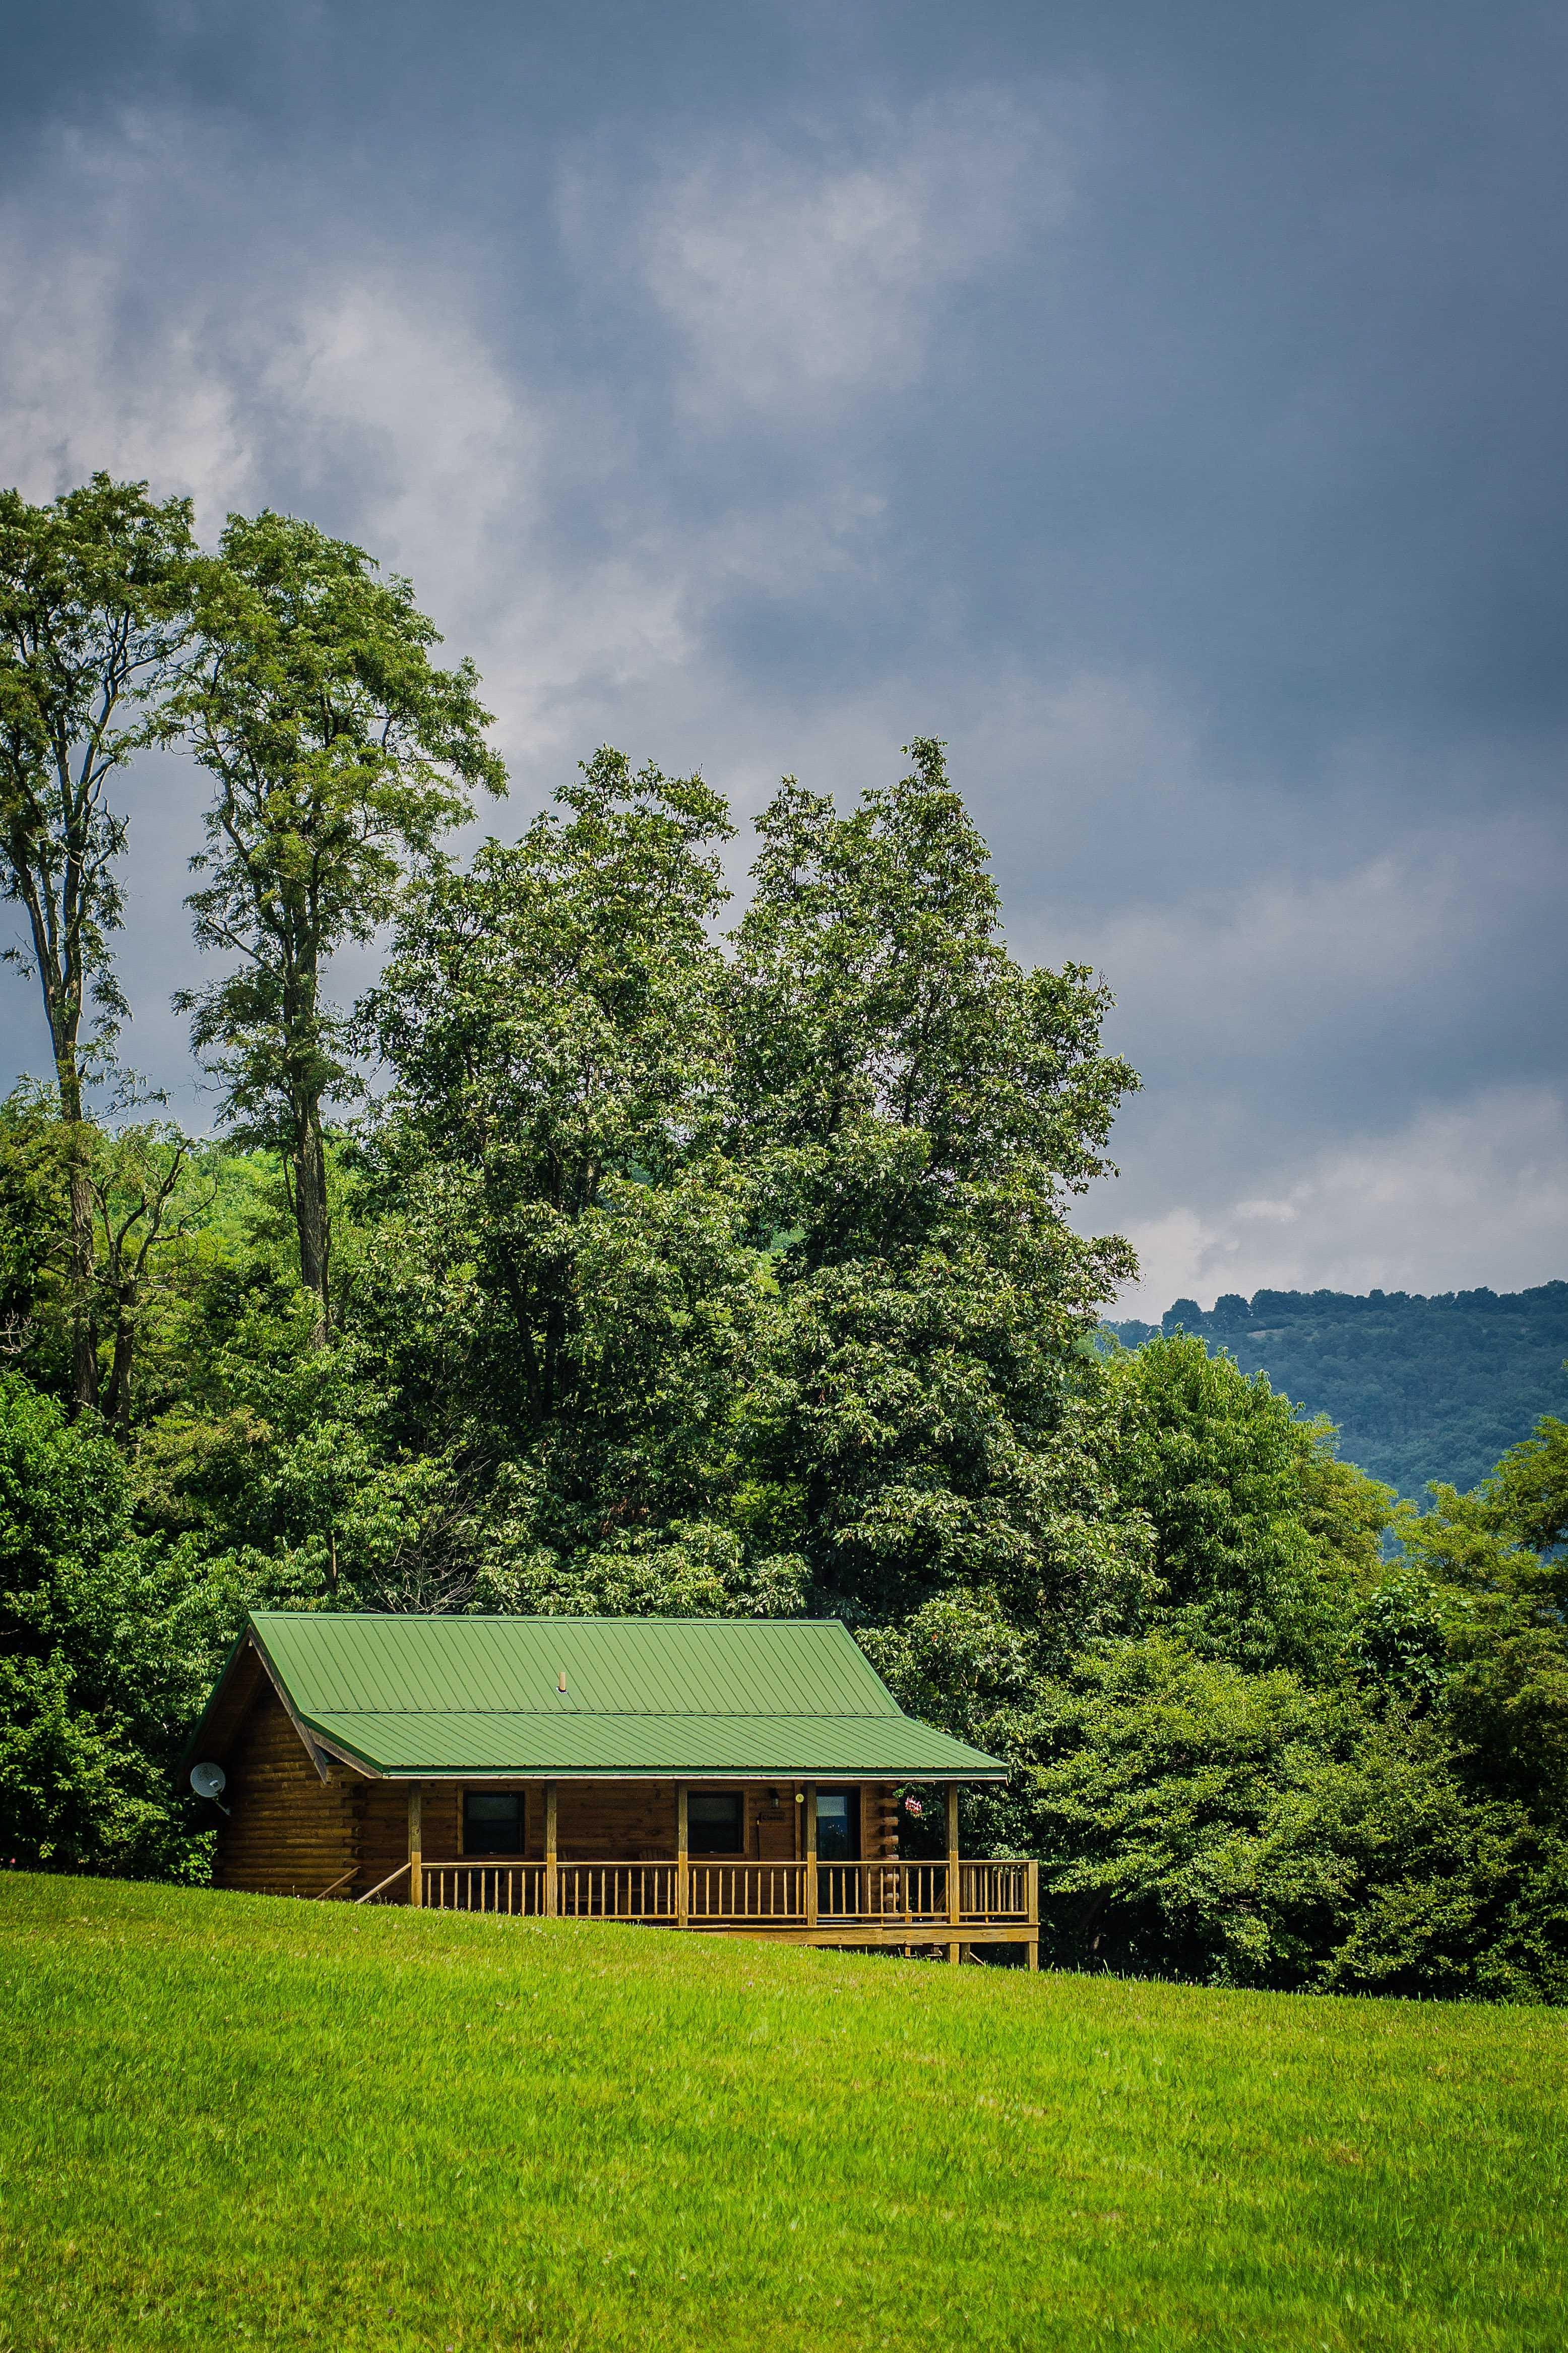 Honeymoon cabin rentals honeymoon cabin rentals wv for Michigan romantic cabins